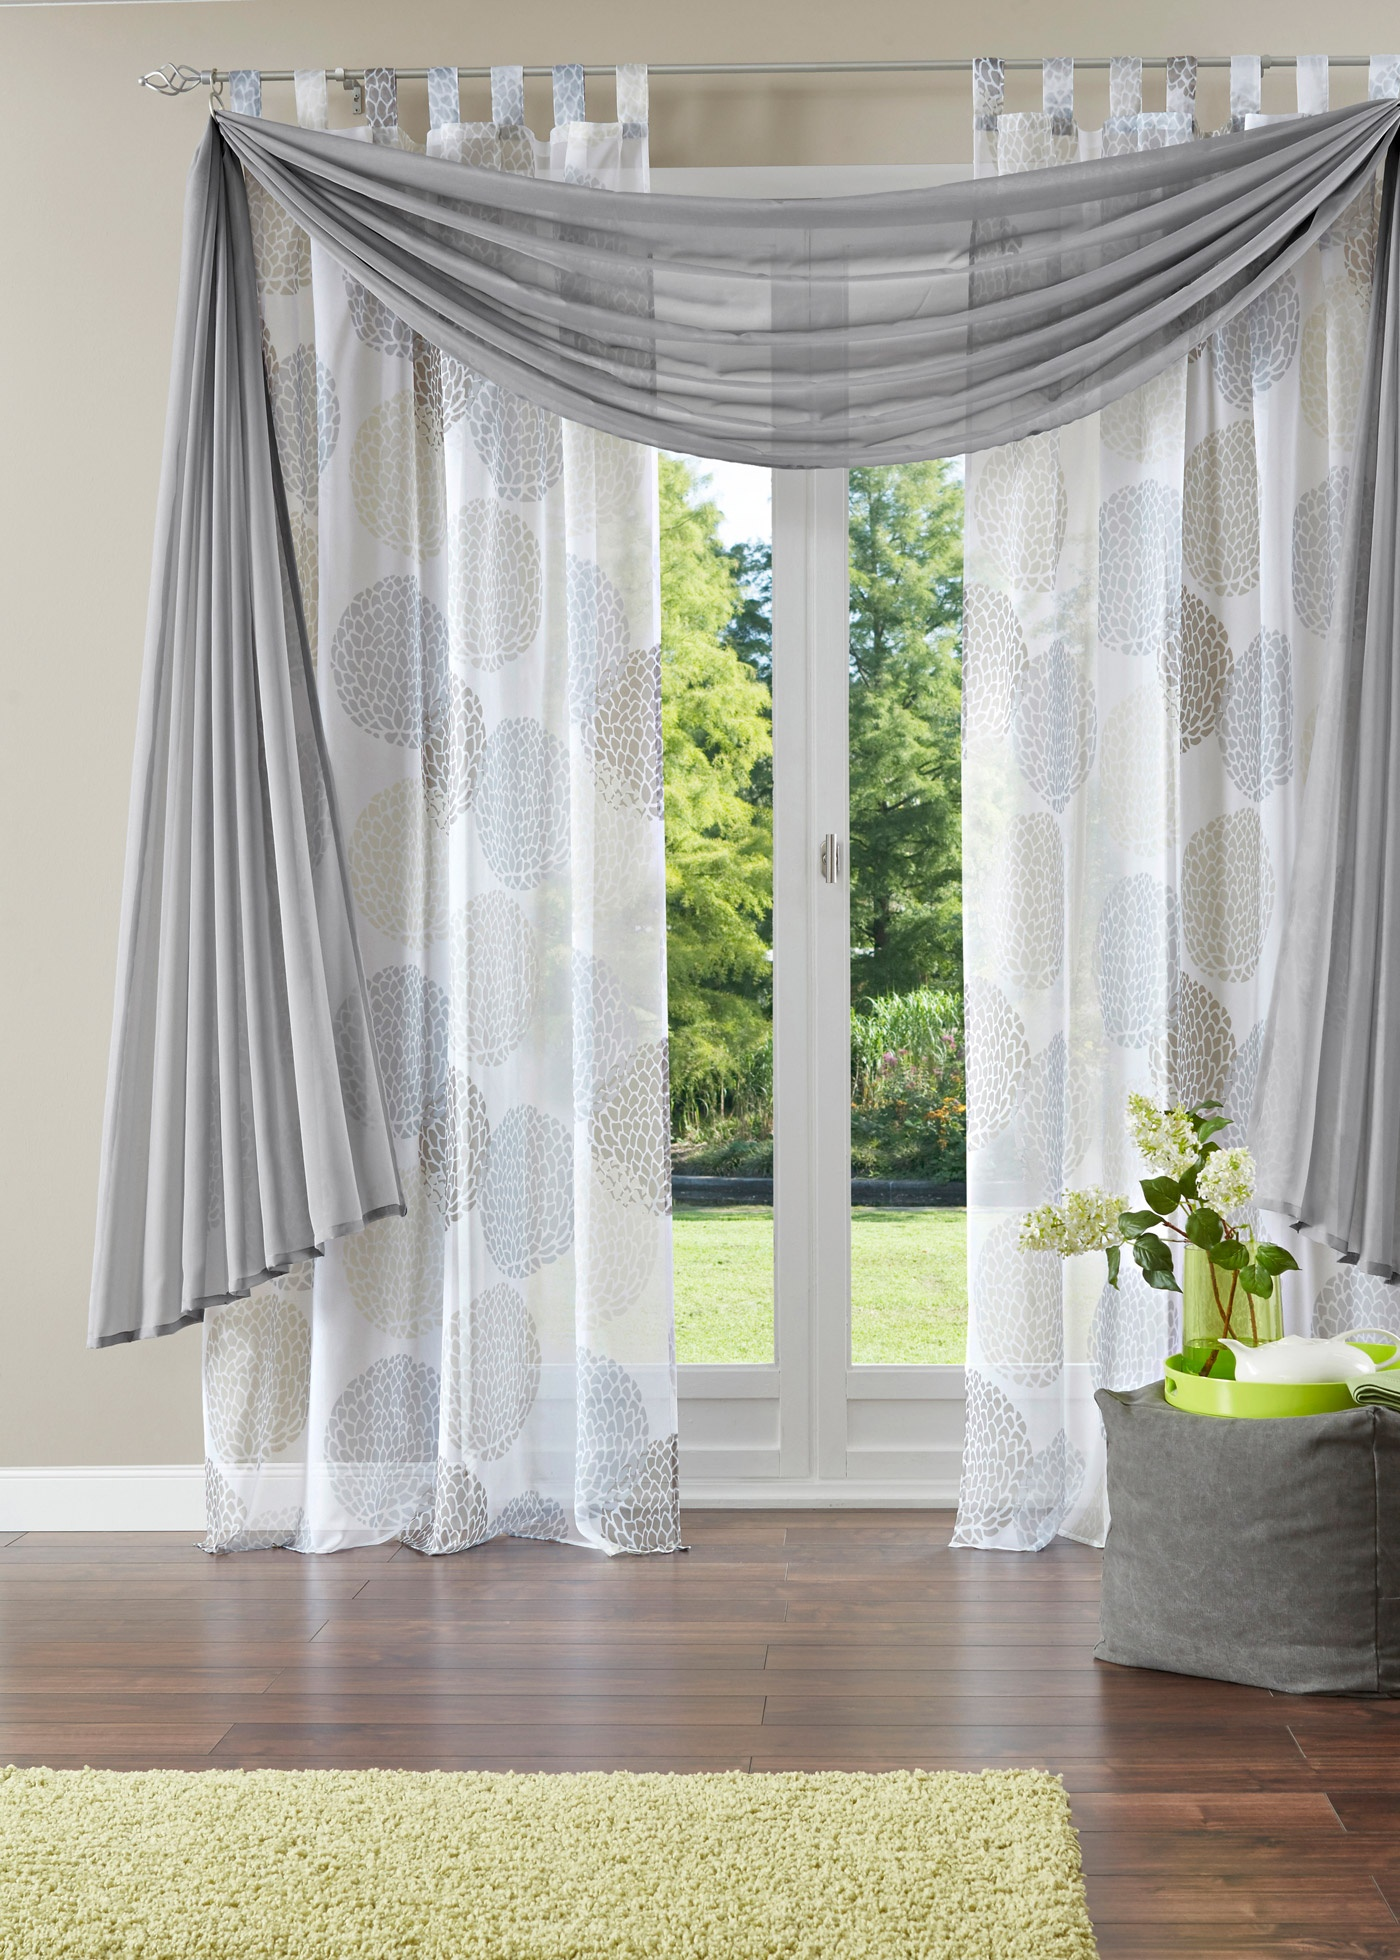 2019 Terri Tulle Pelmets Fabrics Diy Valance Curtains For Living Room Kitchen Drapes Window Treatments Valance Curtains For Bedroom From Newcute